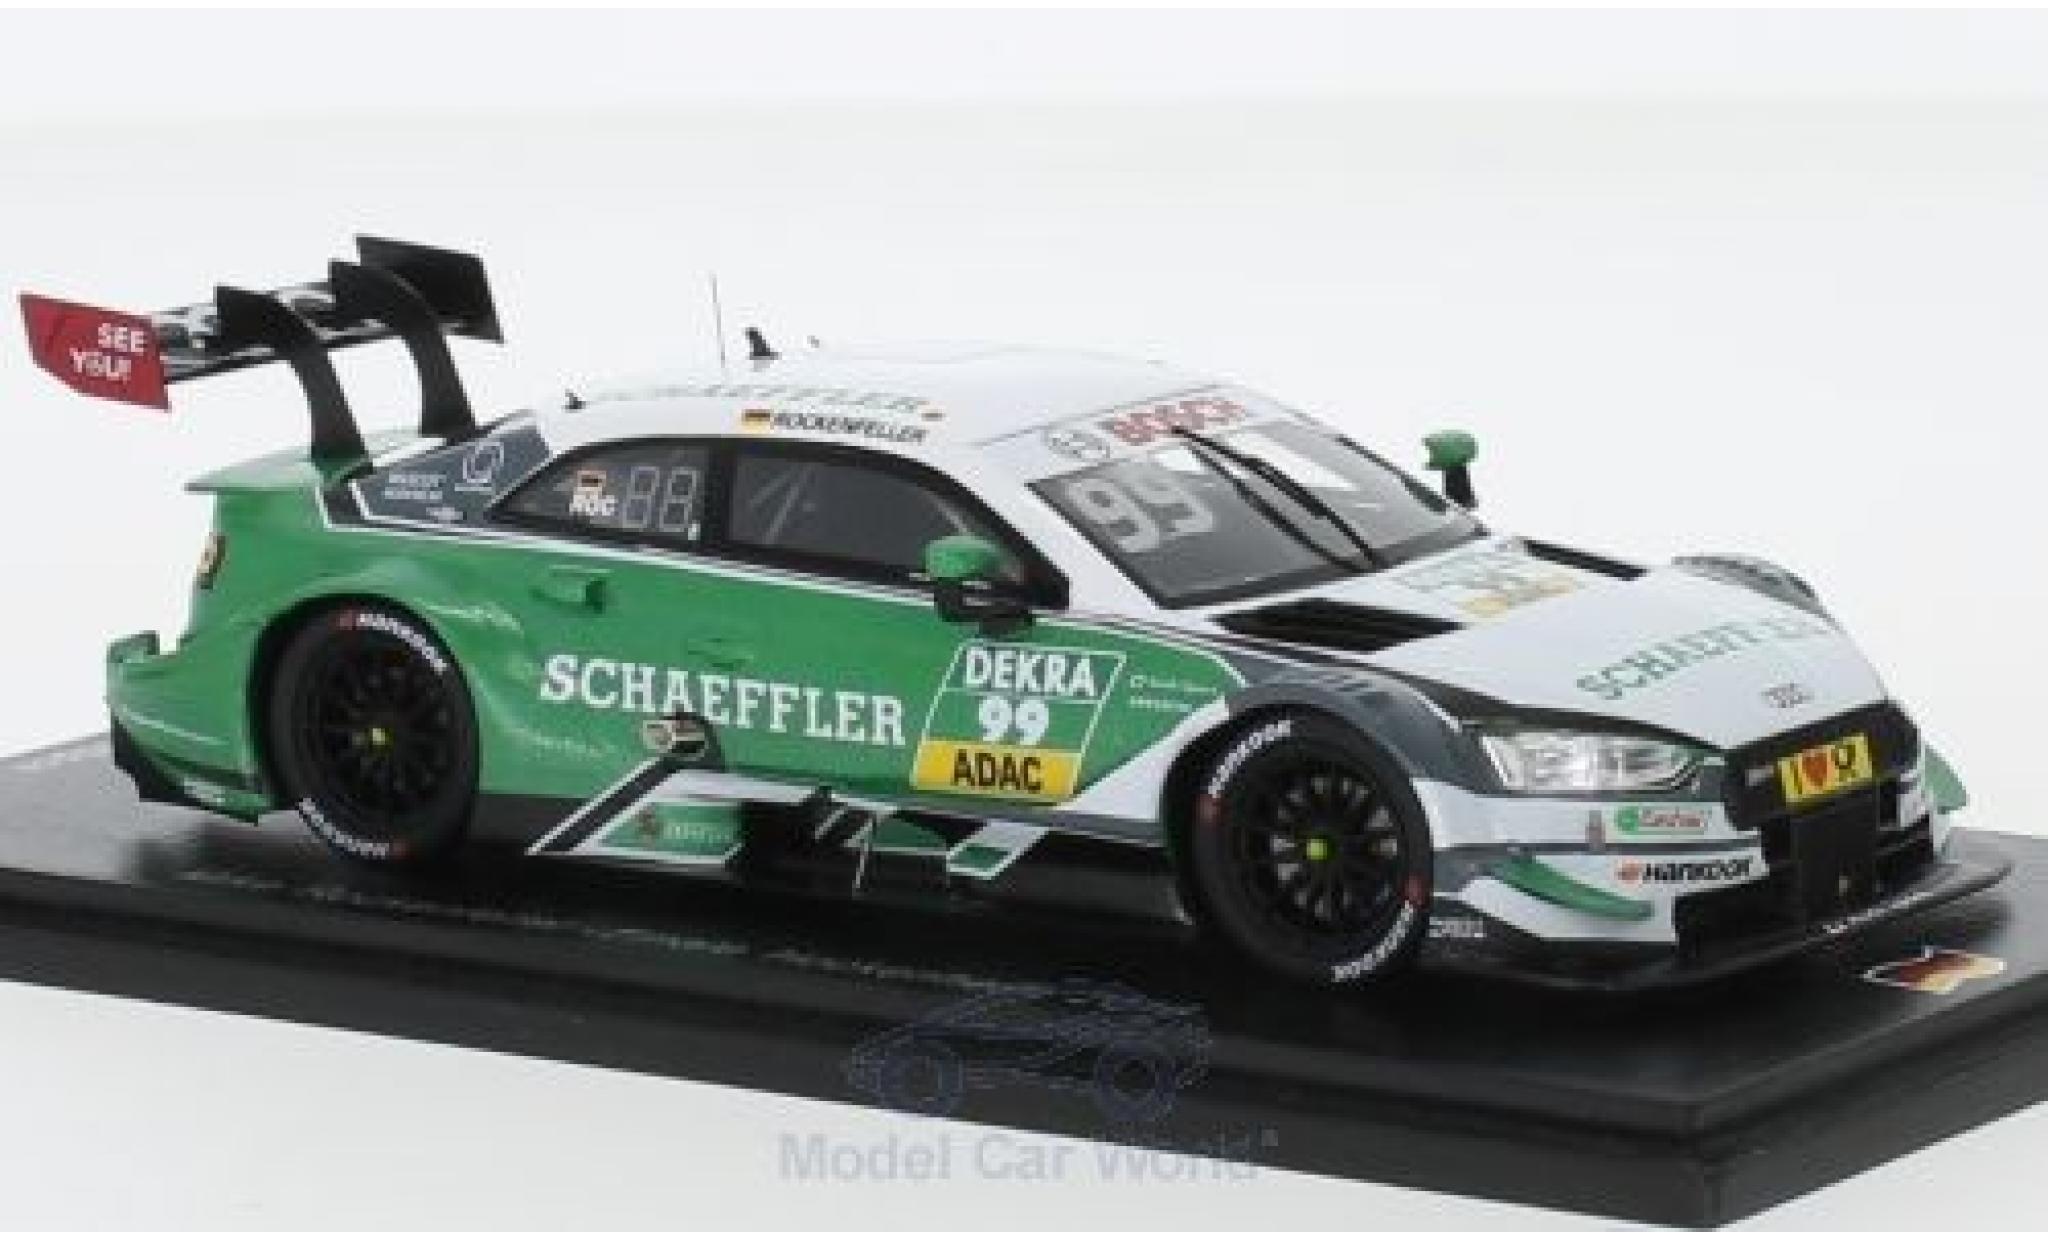 Audi RS5 1/43 Spark RS 5 DTM No.99 Sport Team Phoenix DTM Hockenheim 2018 M.Rockenfeller